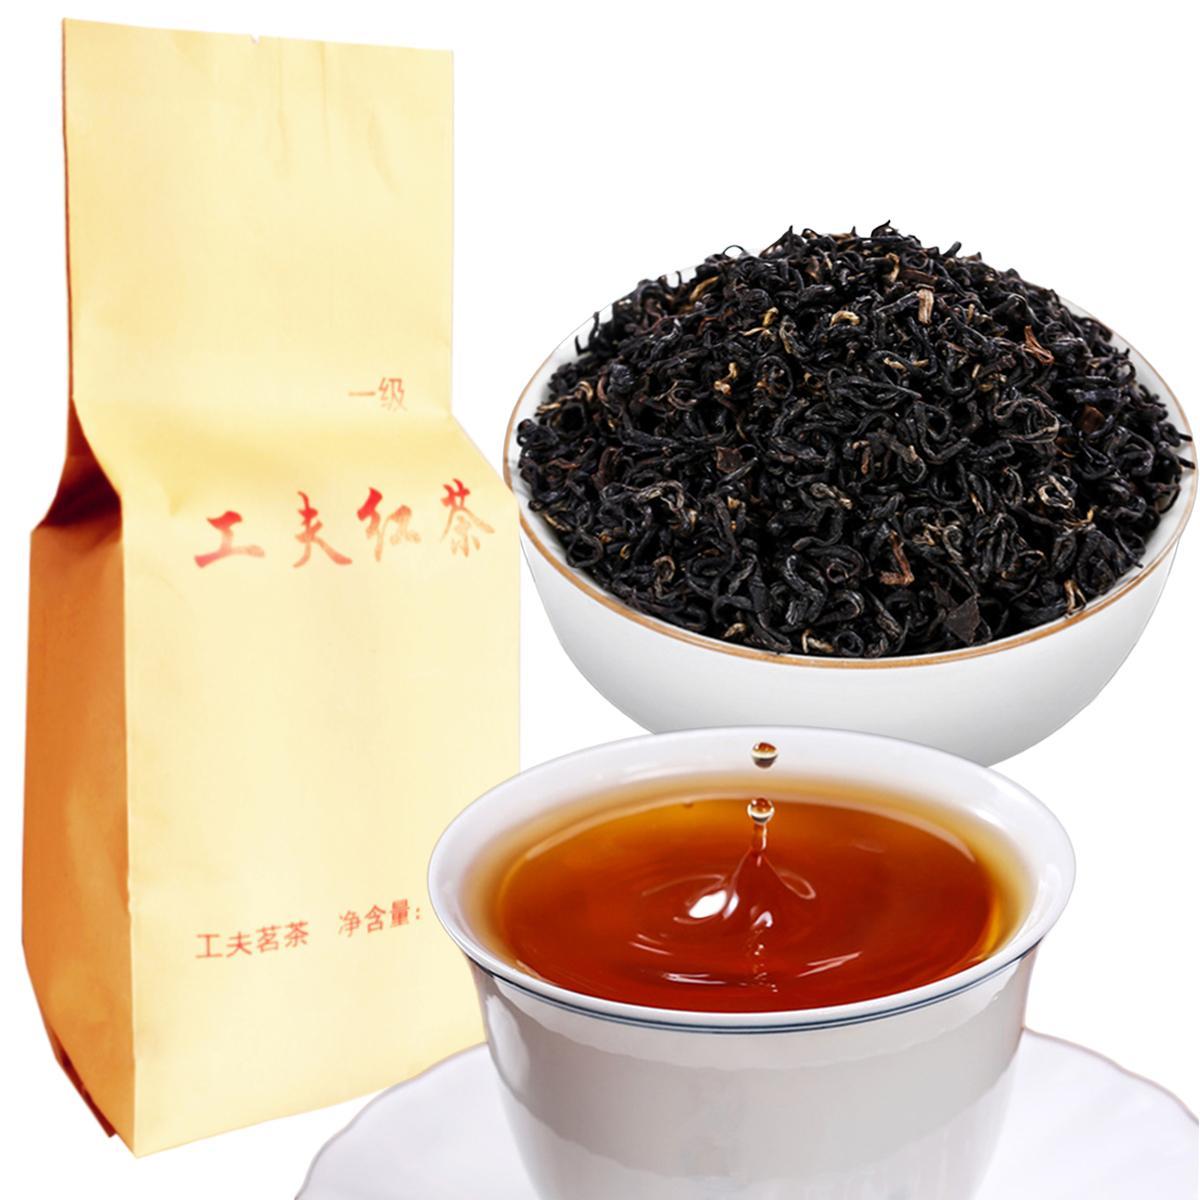 250g Çin Organik Siyah Çay Yunnan Üst dereceli Kongfu Dianhong Kırmızı Çay Sağlık Yeni Çay Yeşil Gıda Kraft Tercih Edilen ambalaj Pişmiş